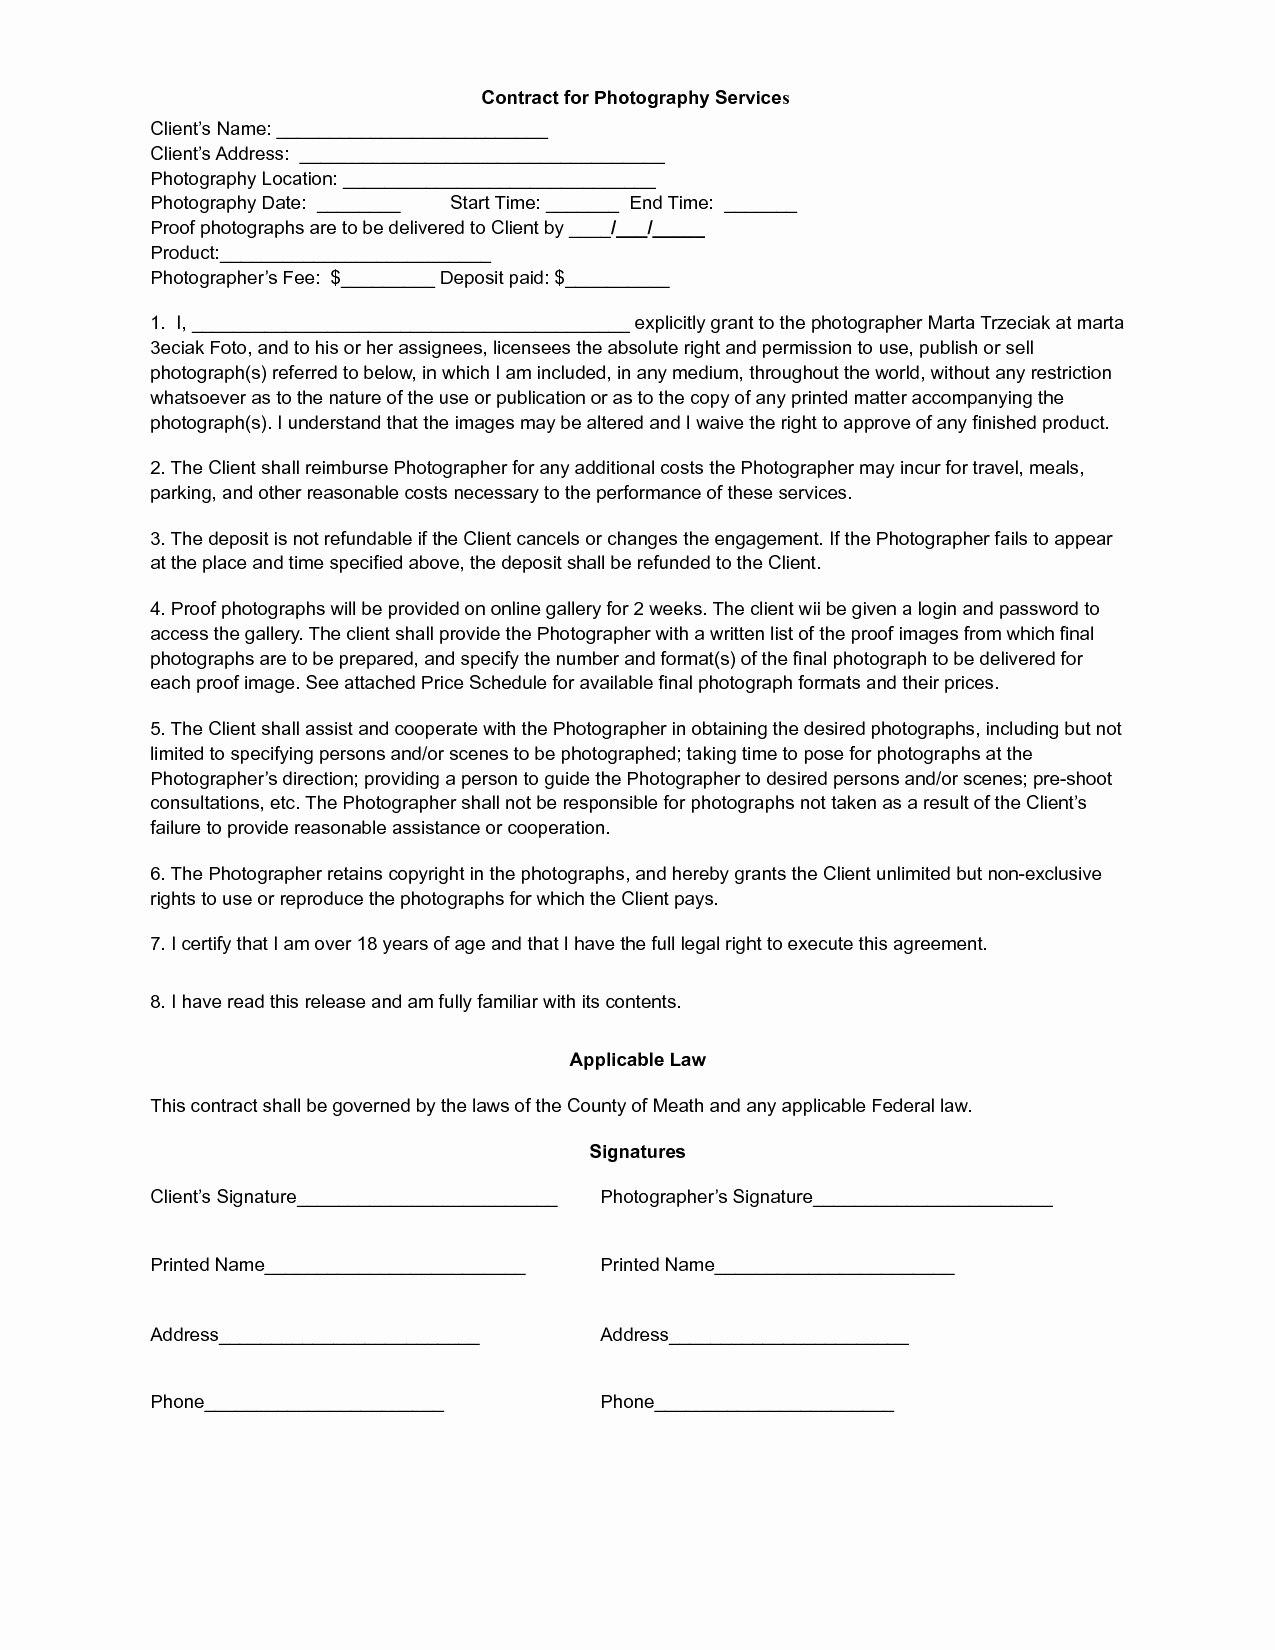 Free Hipaa Business Associate Agreement Form – Guiaubuntupt Throughout Business Associate Agreement Hipaa Template